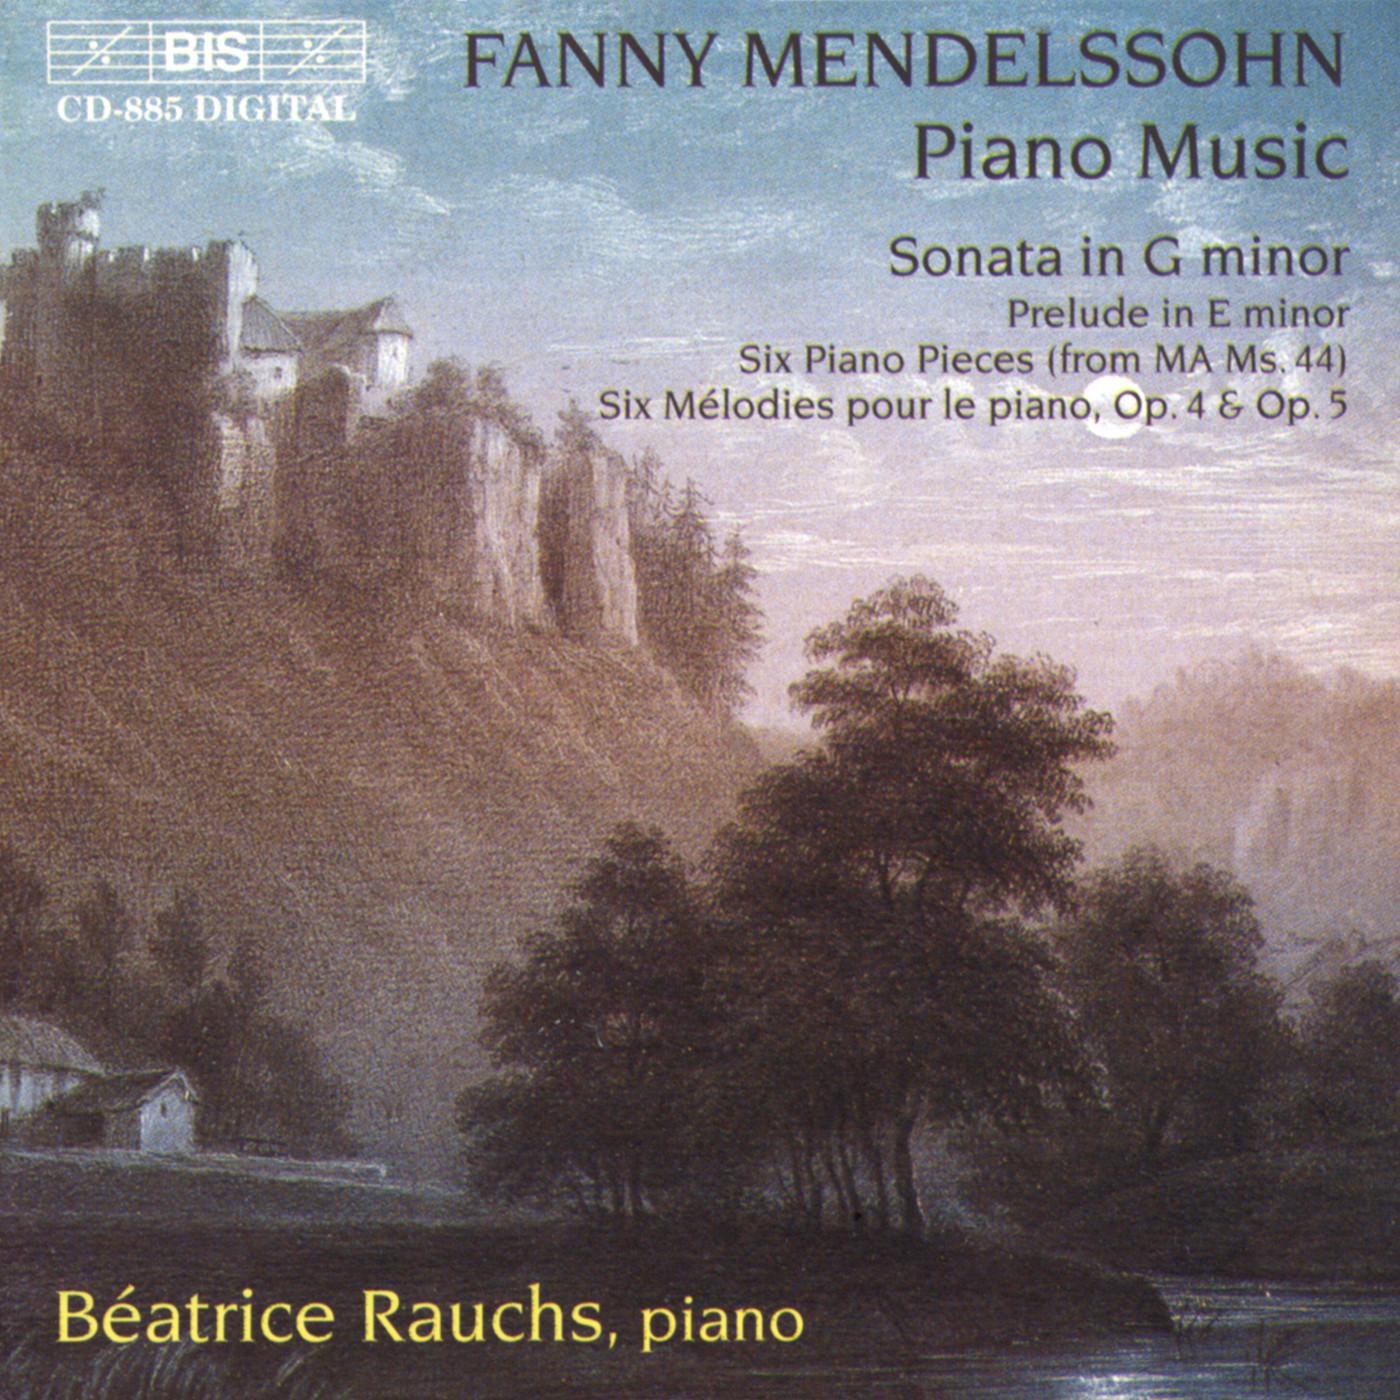 Mendelssohn's sister finally has her own musical genius honoured